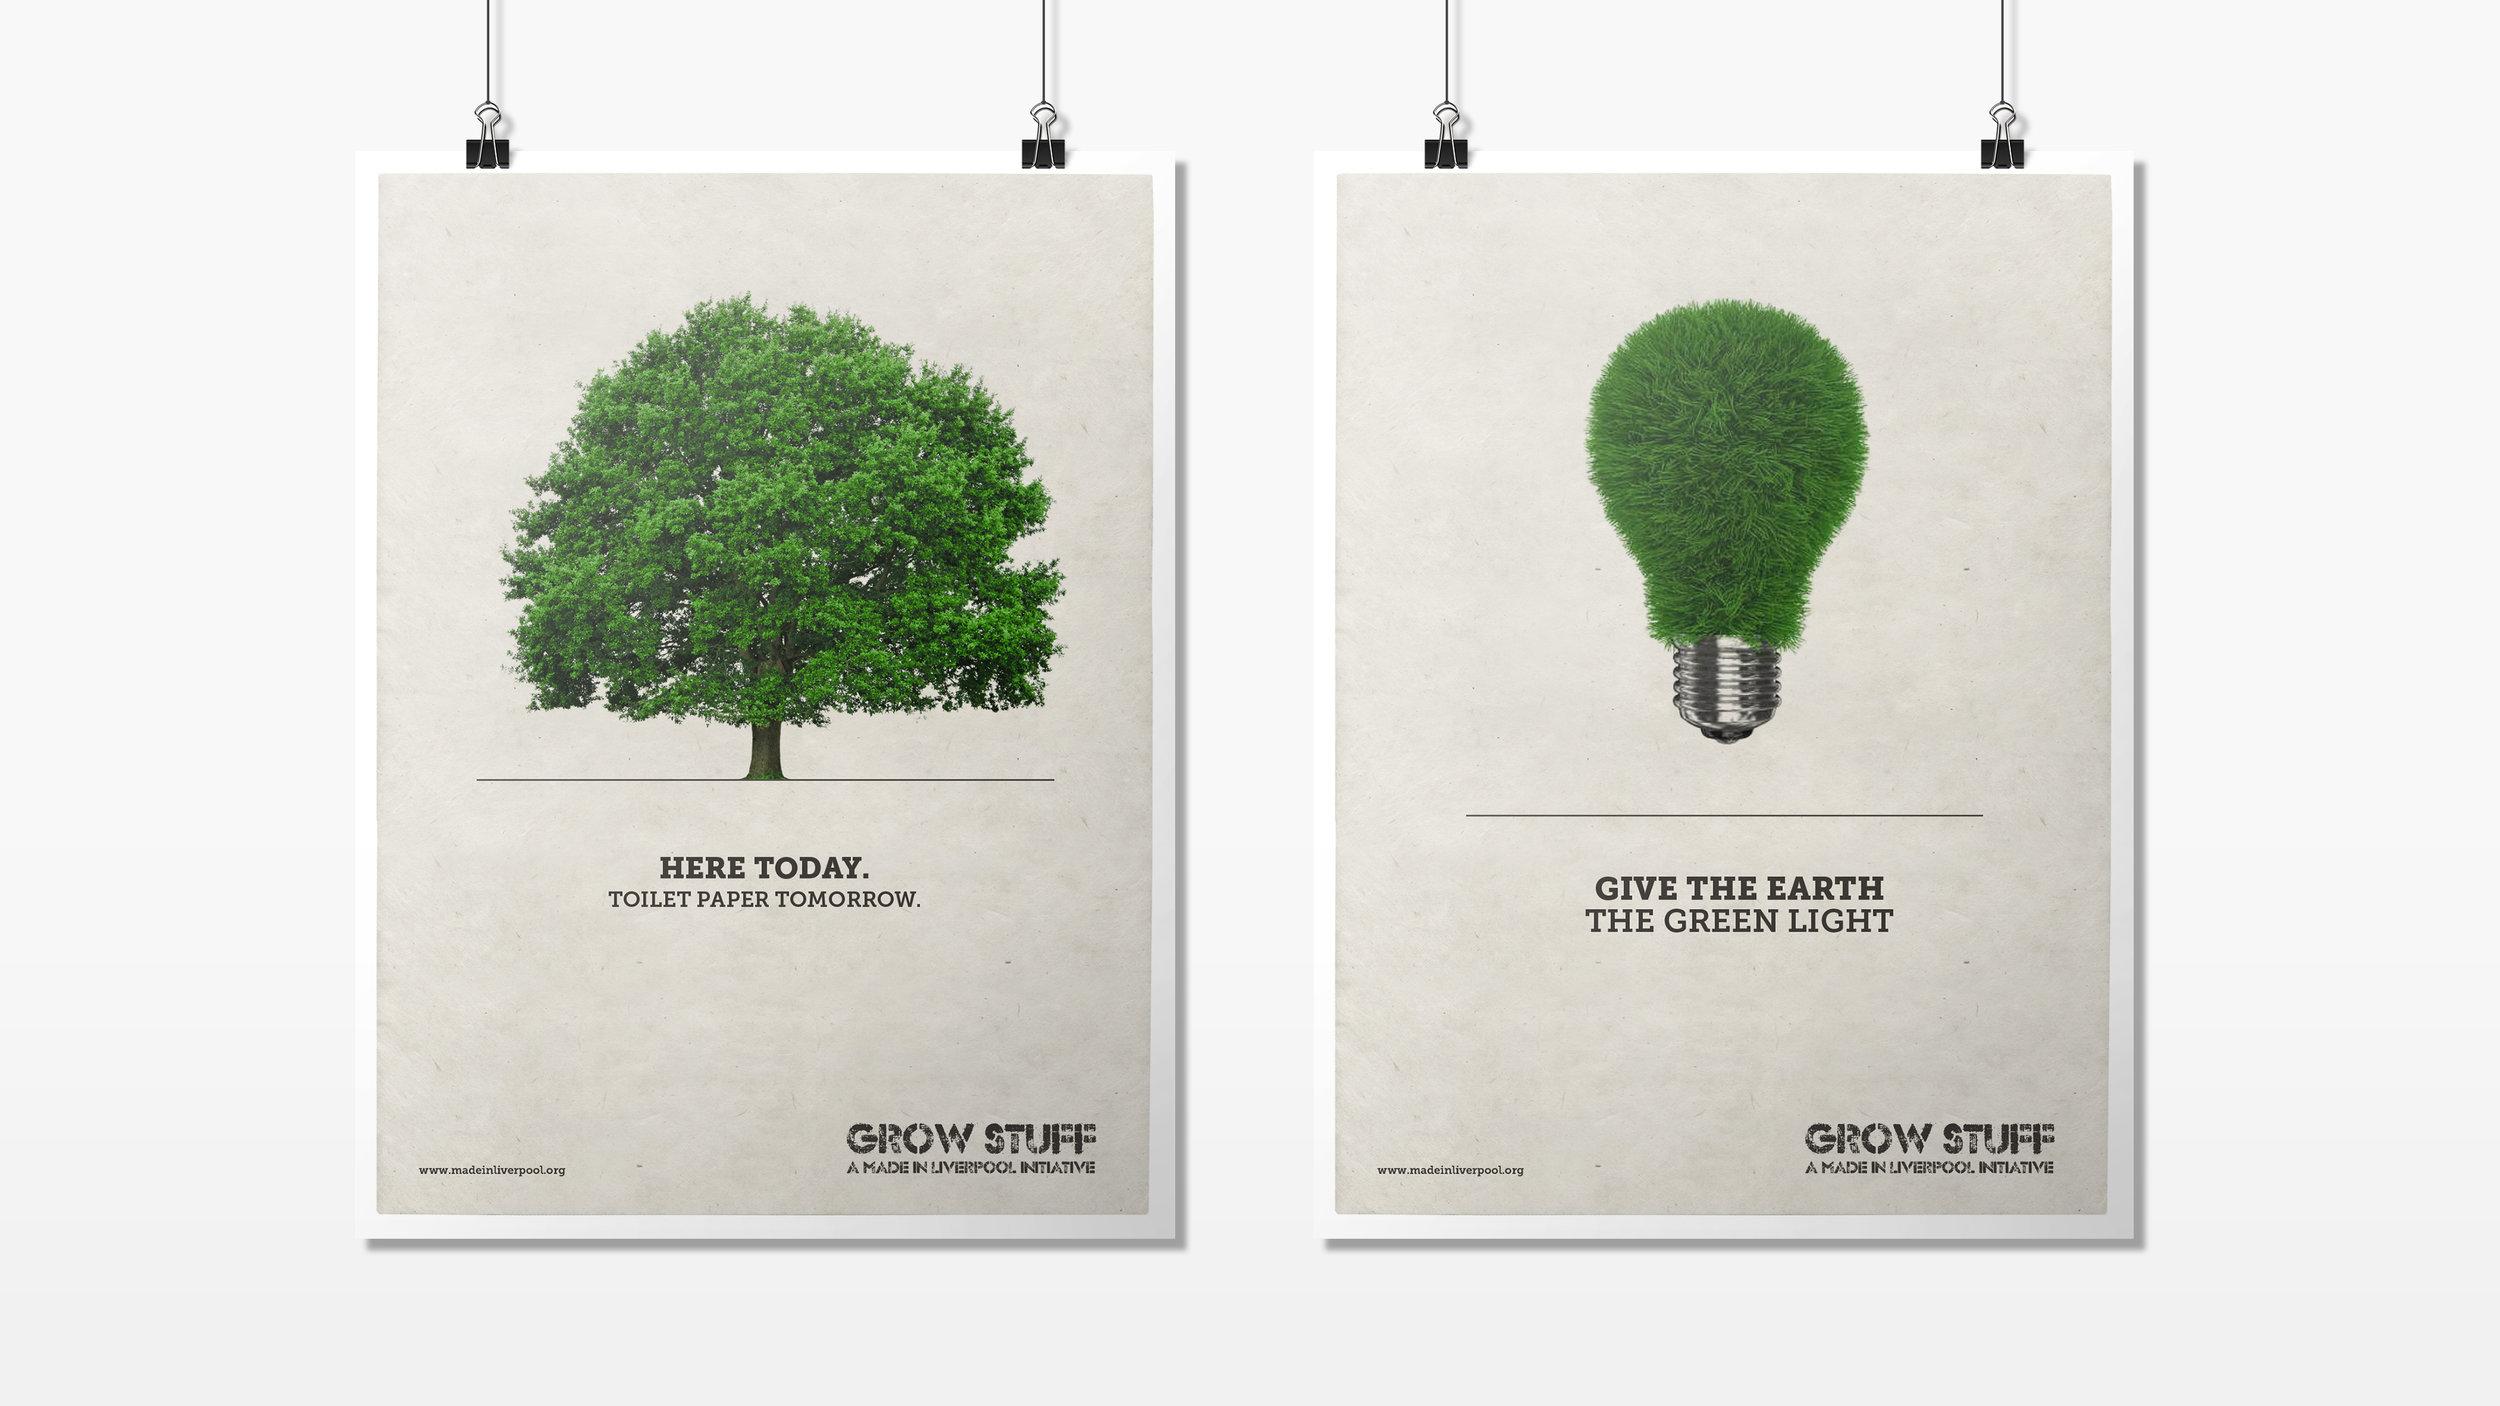 Brand_republica_Made_In_Liverpool_eco_poster_design_01.jpg